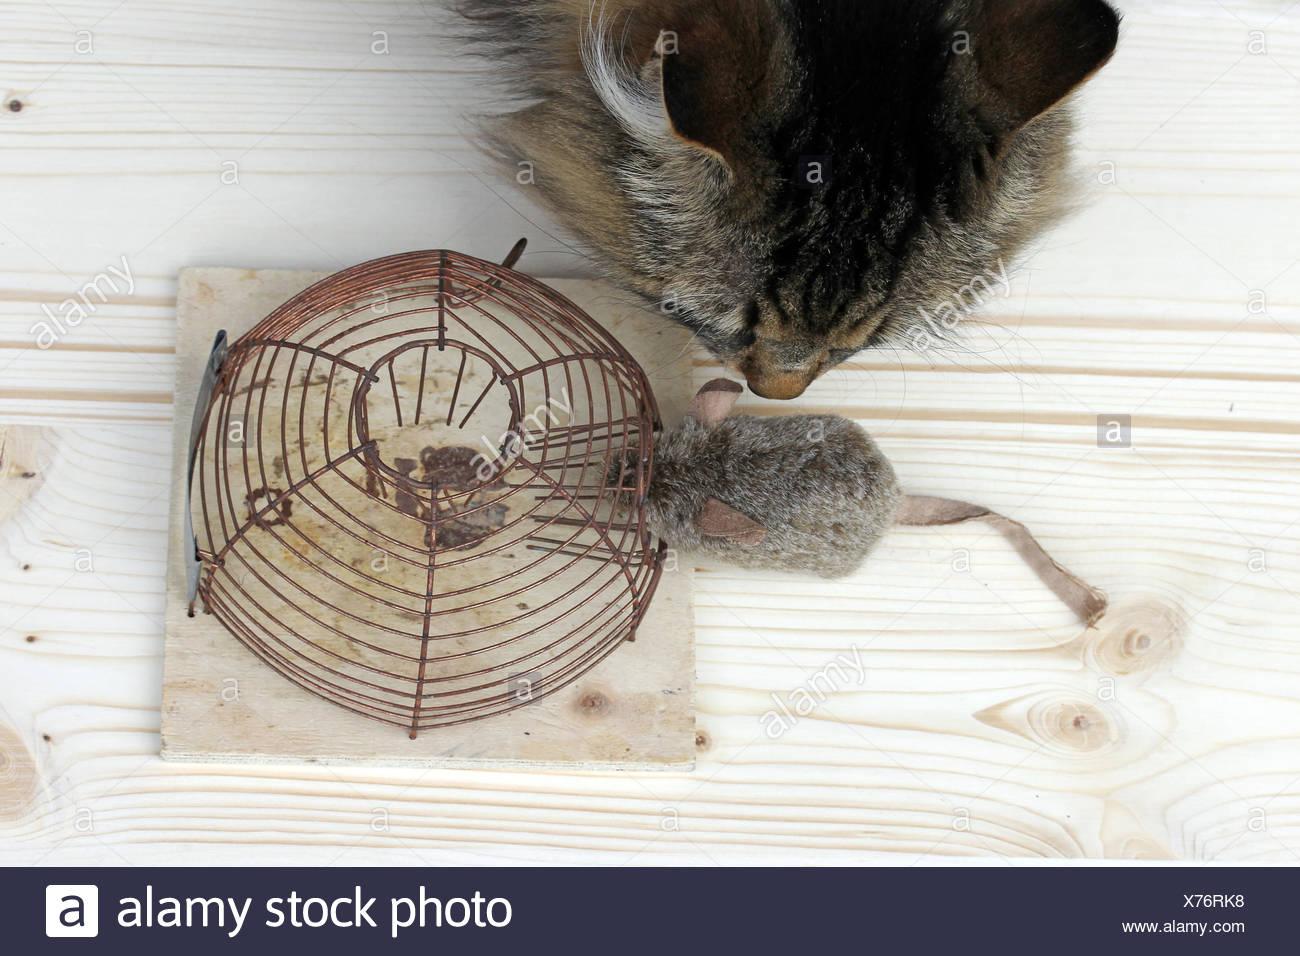 female animal Stock Photo